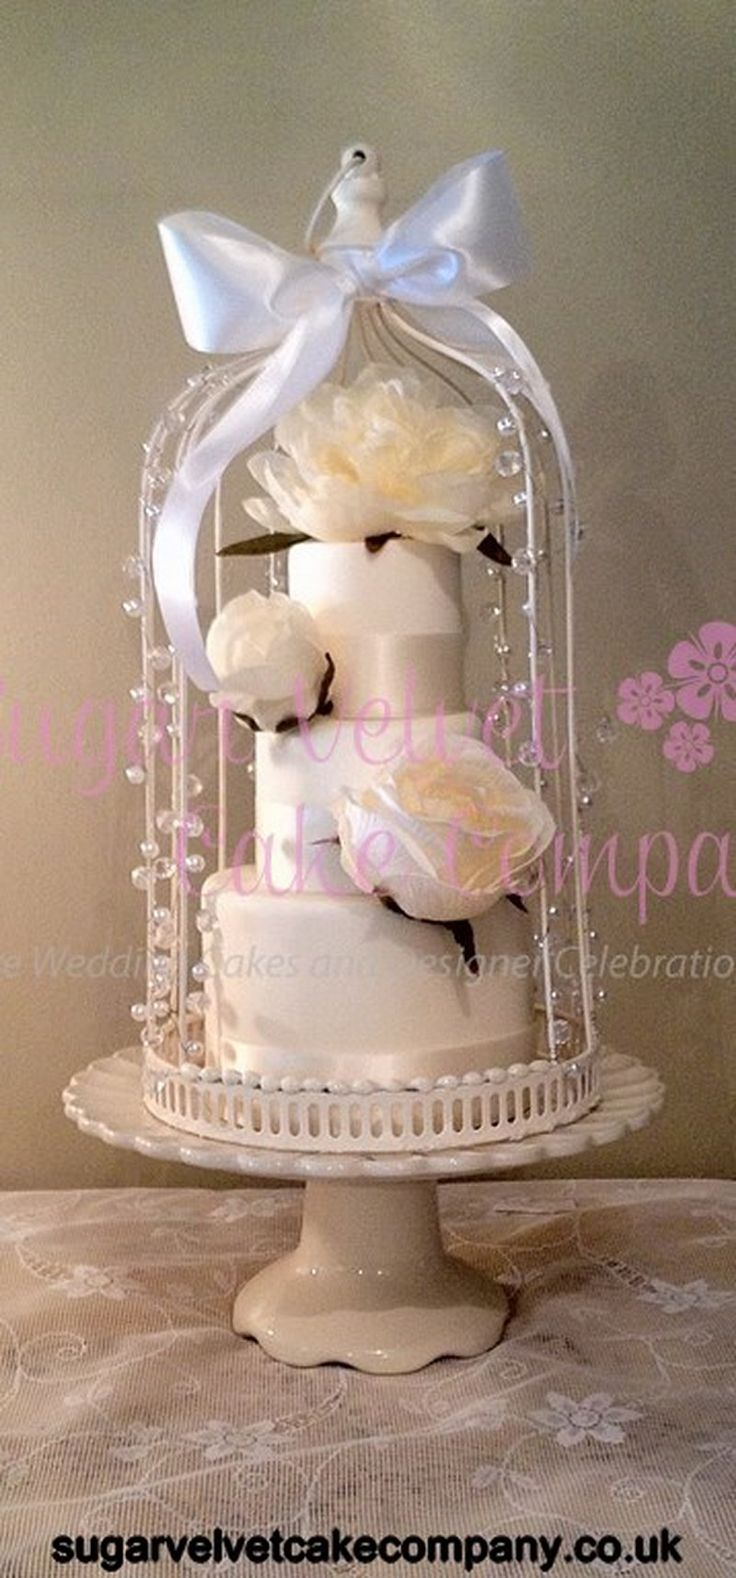 The Sugar Velvet Cake Company Miniature Birdcage (Copy) (Copy)